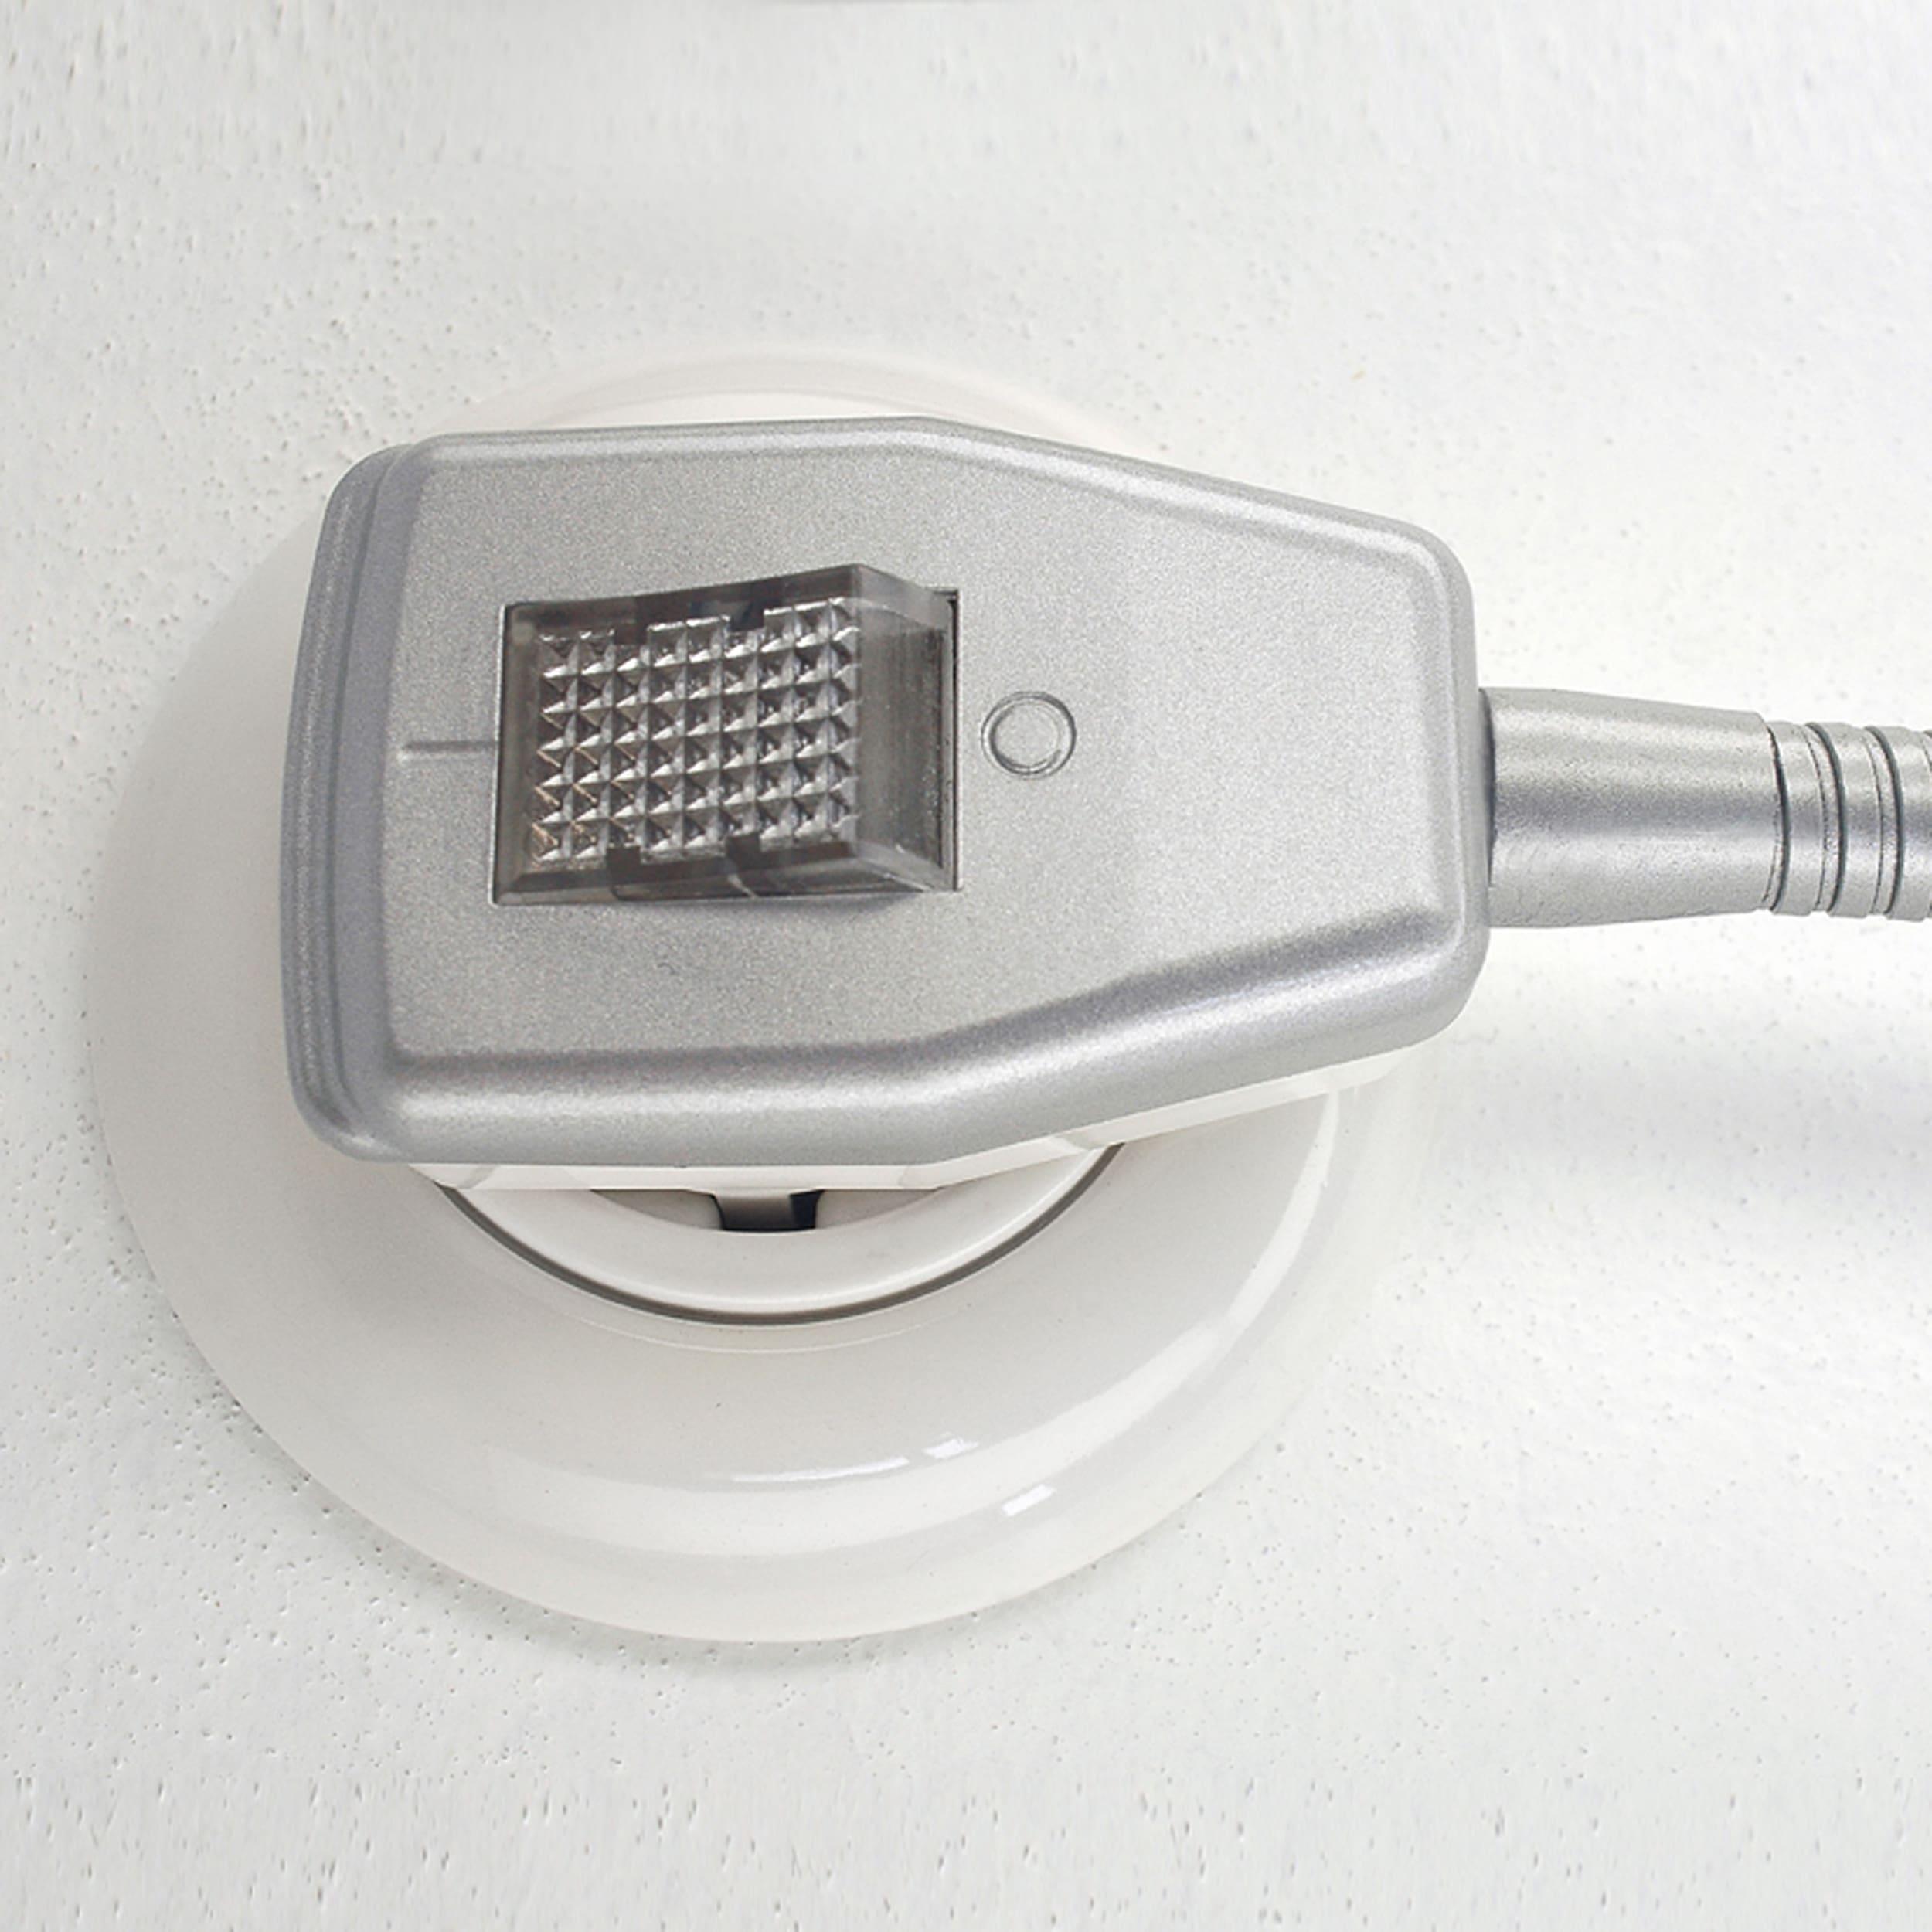 Glühwürmchen Metallikus LED Alu-Kegelreflektor